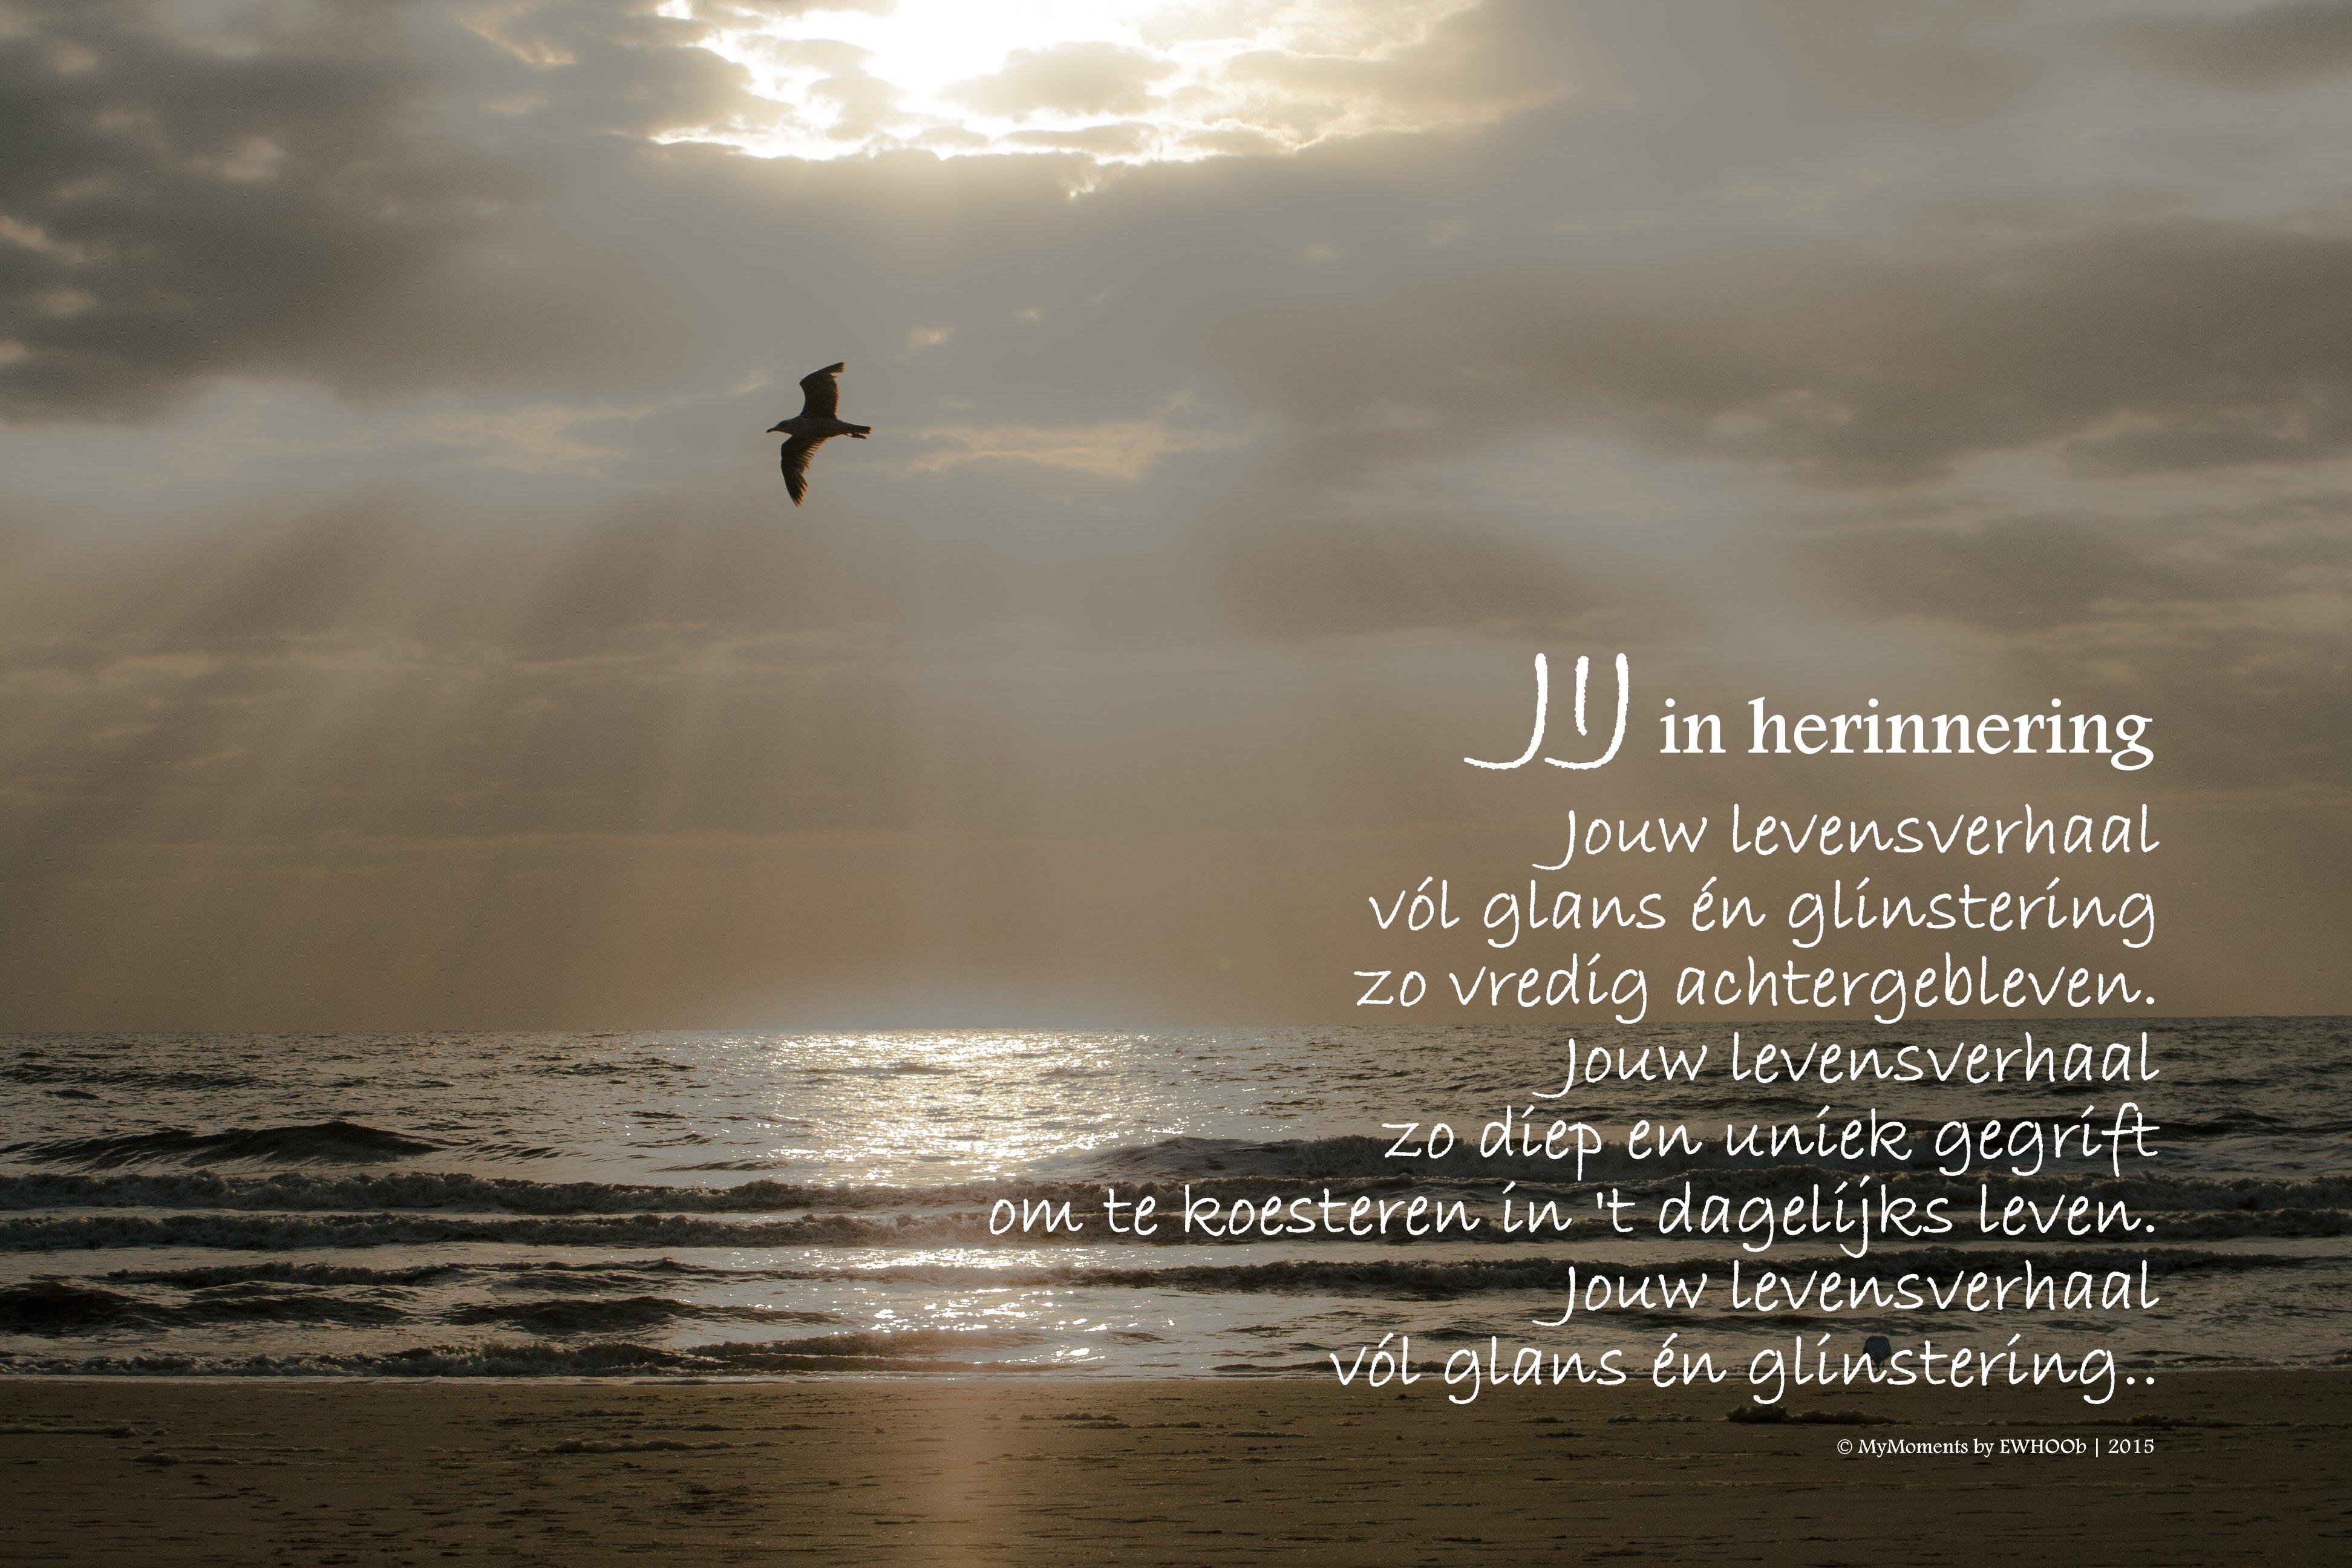 Verbazingwekkend Foto's en gedichten - ewhoob.nl EU-95